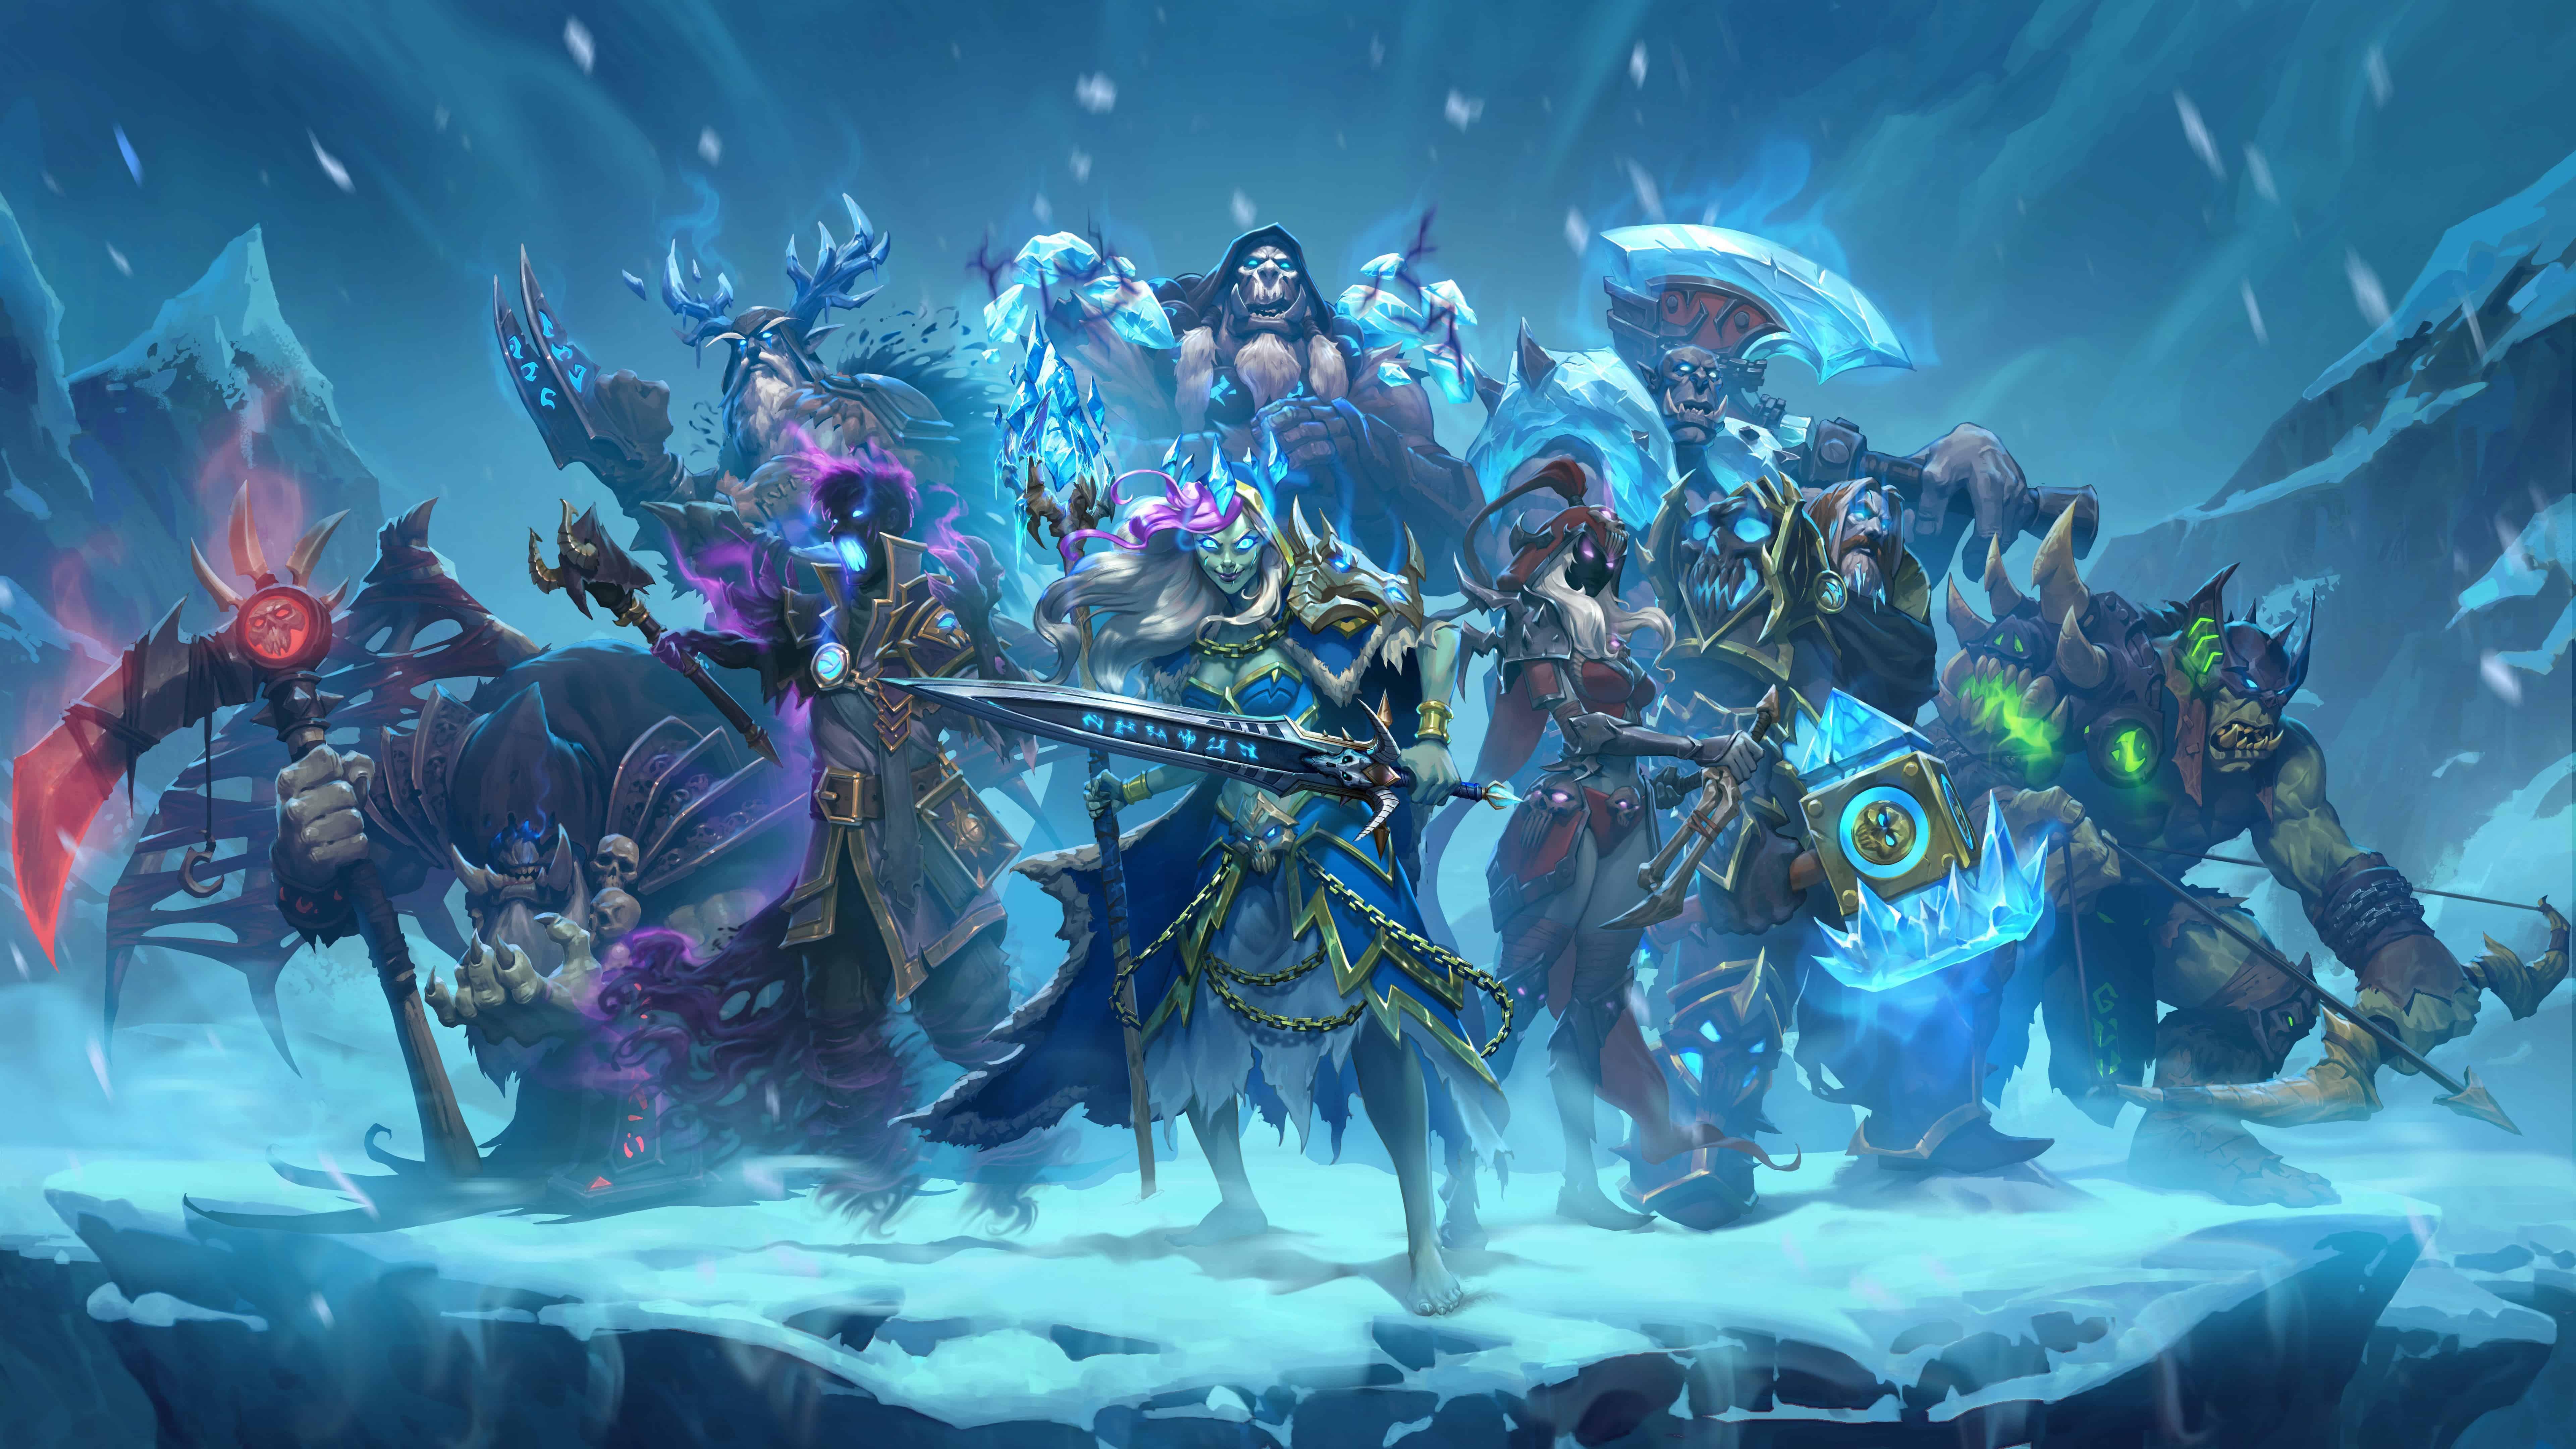 hearthstone knights of the frozen throne uhd 8k wallpaper